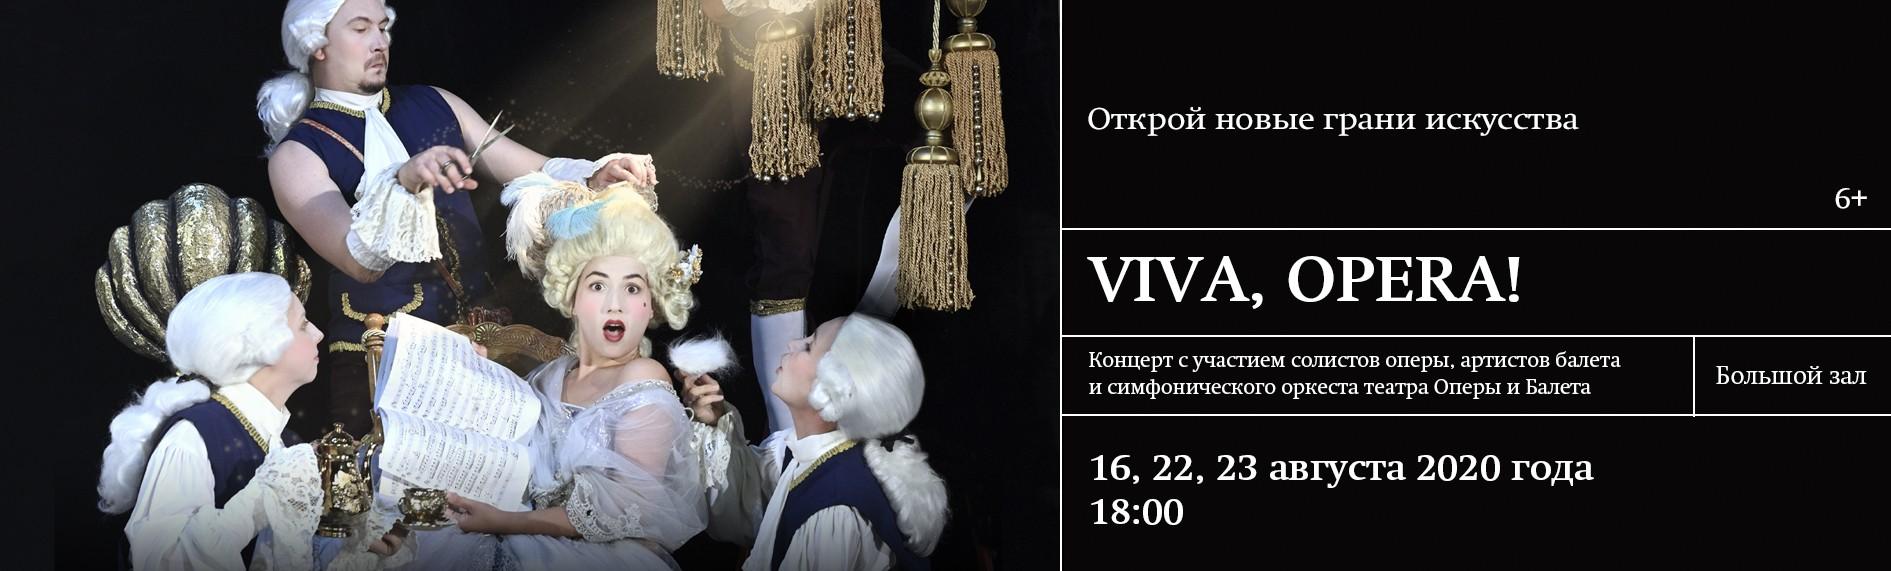 "Концерт ""Viva opera!"""